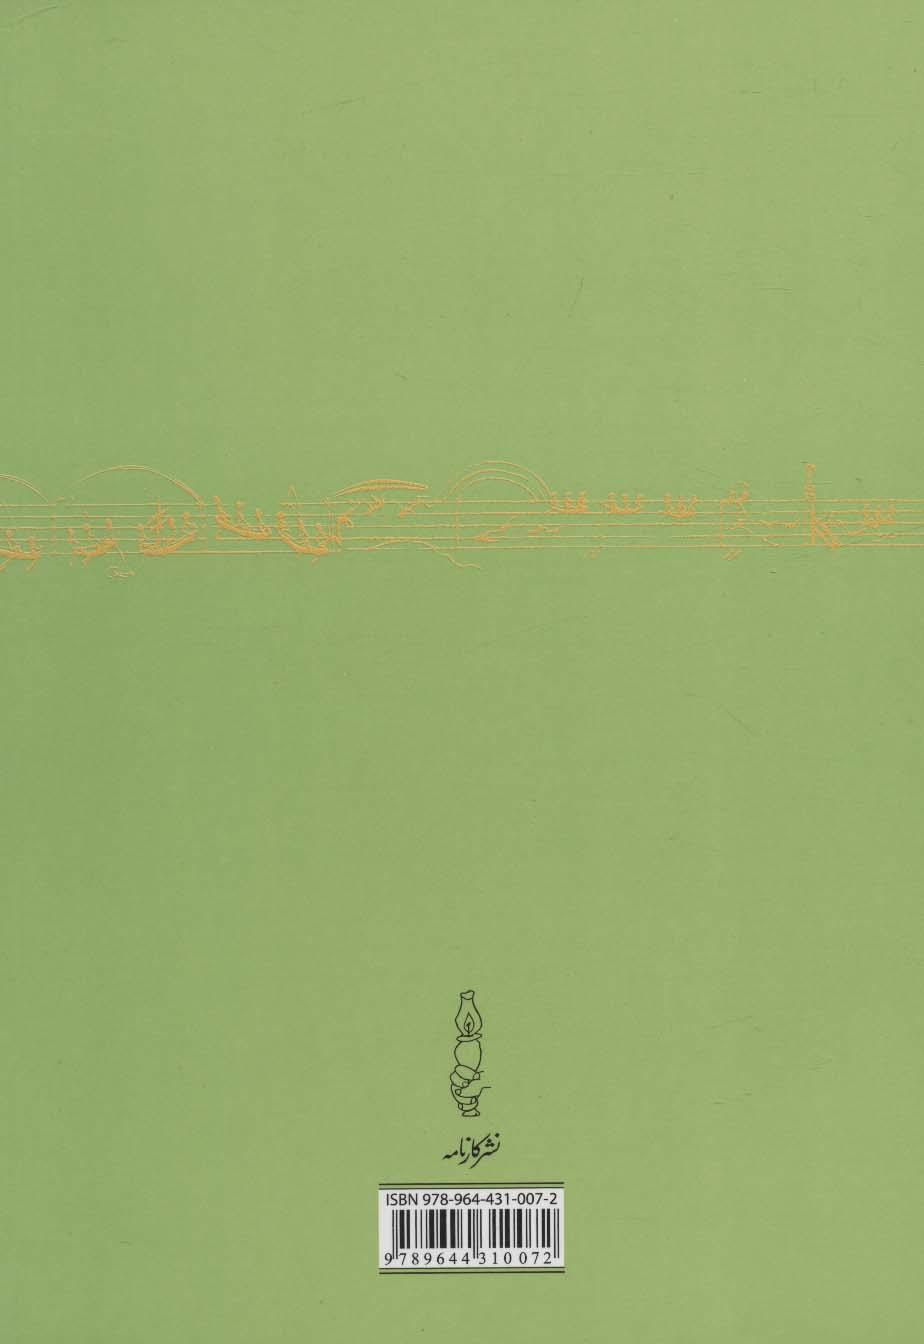 تئوری بنیادی موسیقی